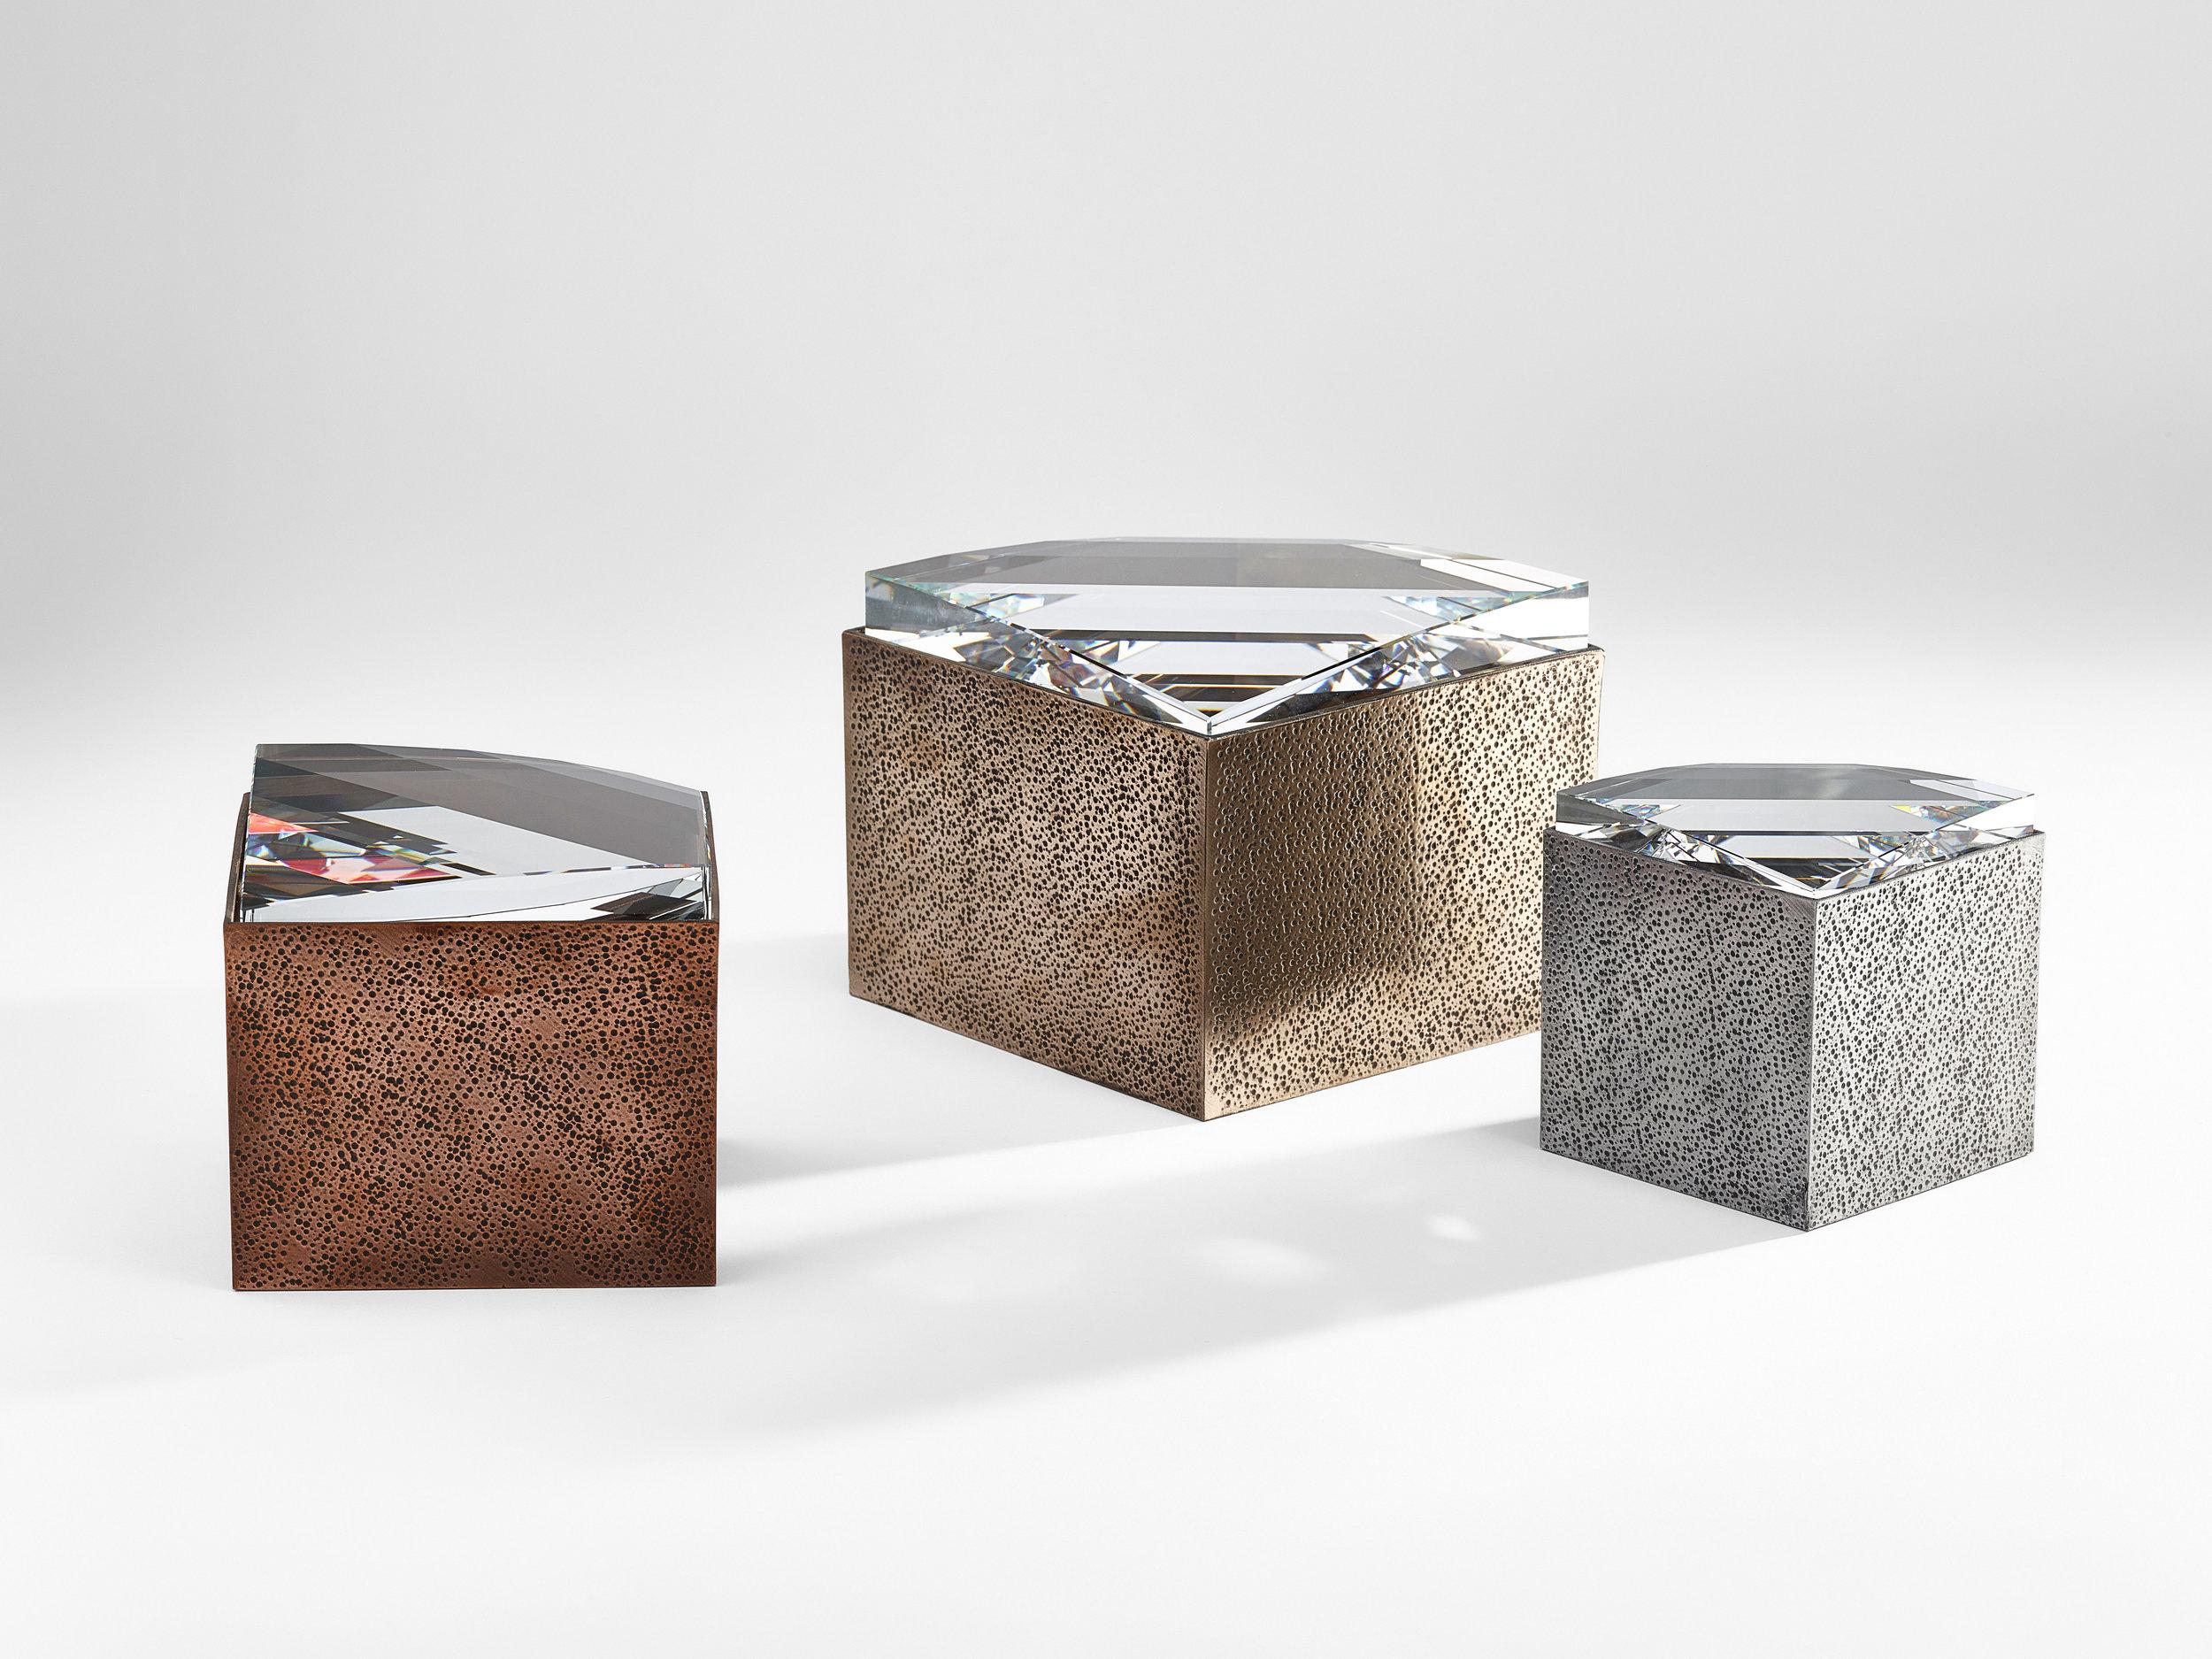 for_web_Lustra-for-Atelier-Swarovski-Home-by-Andre-Kikoski_Boxes_Group-(27).jpg